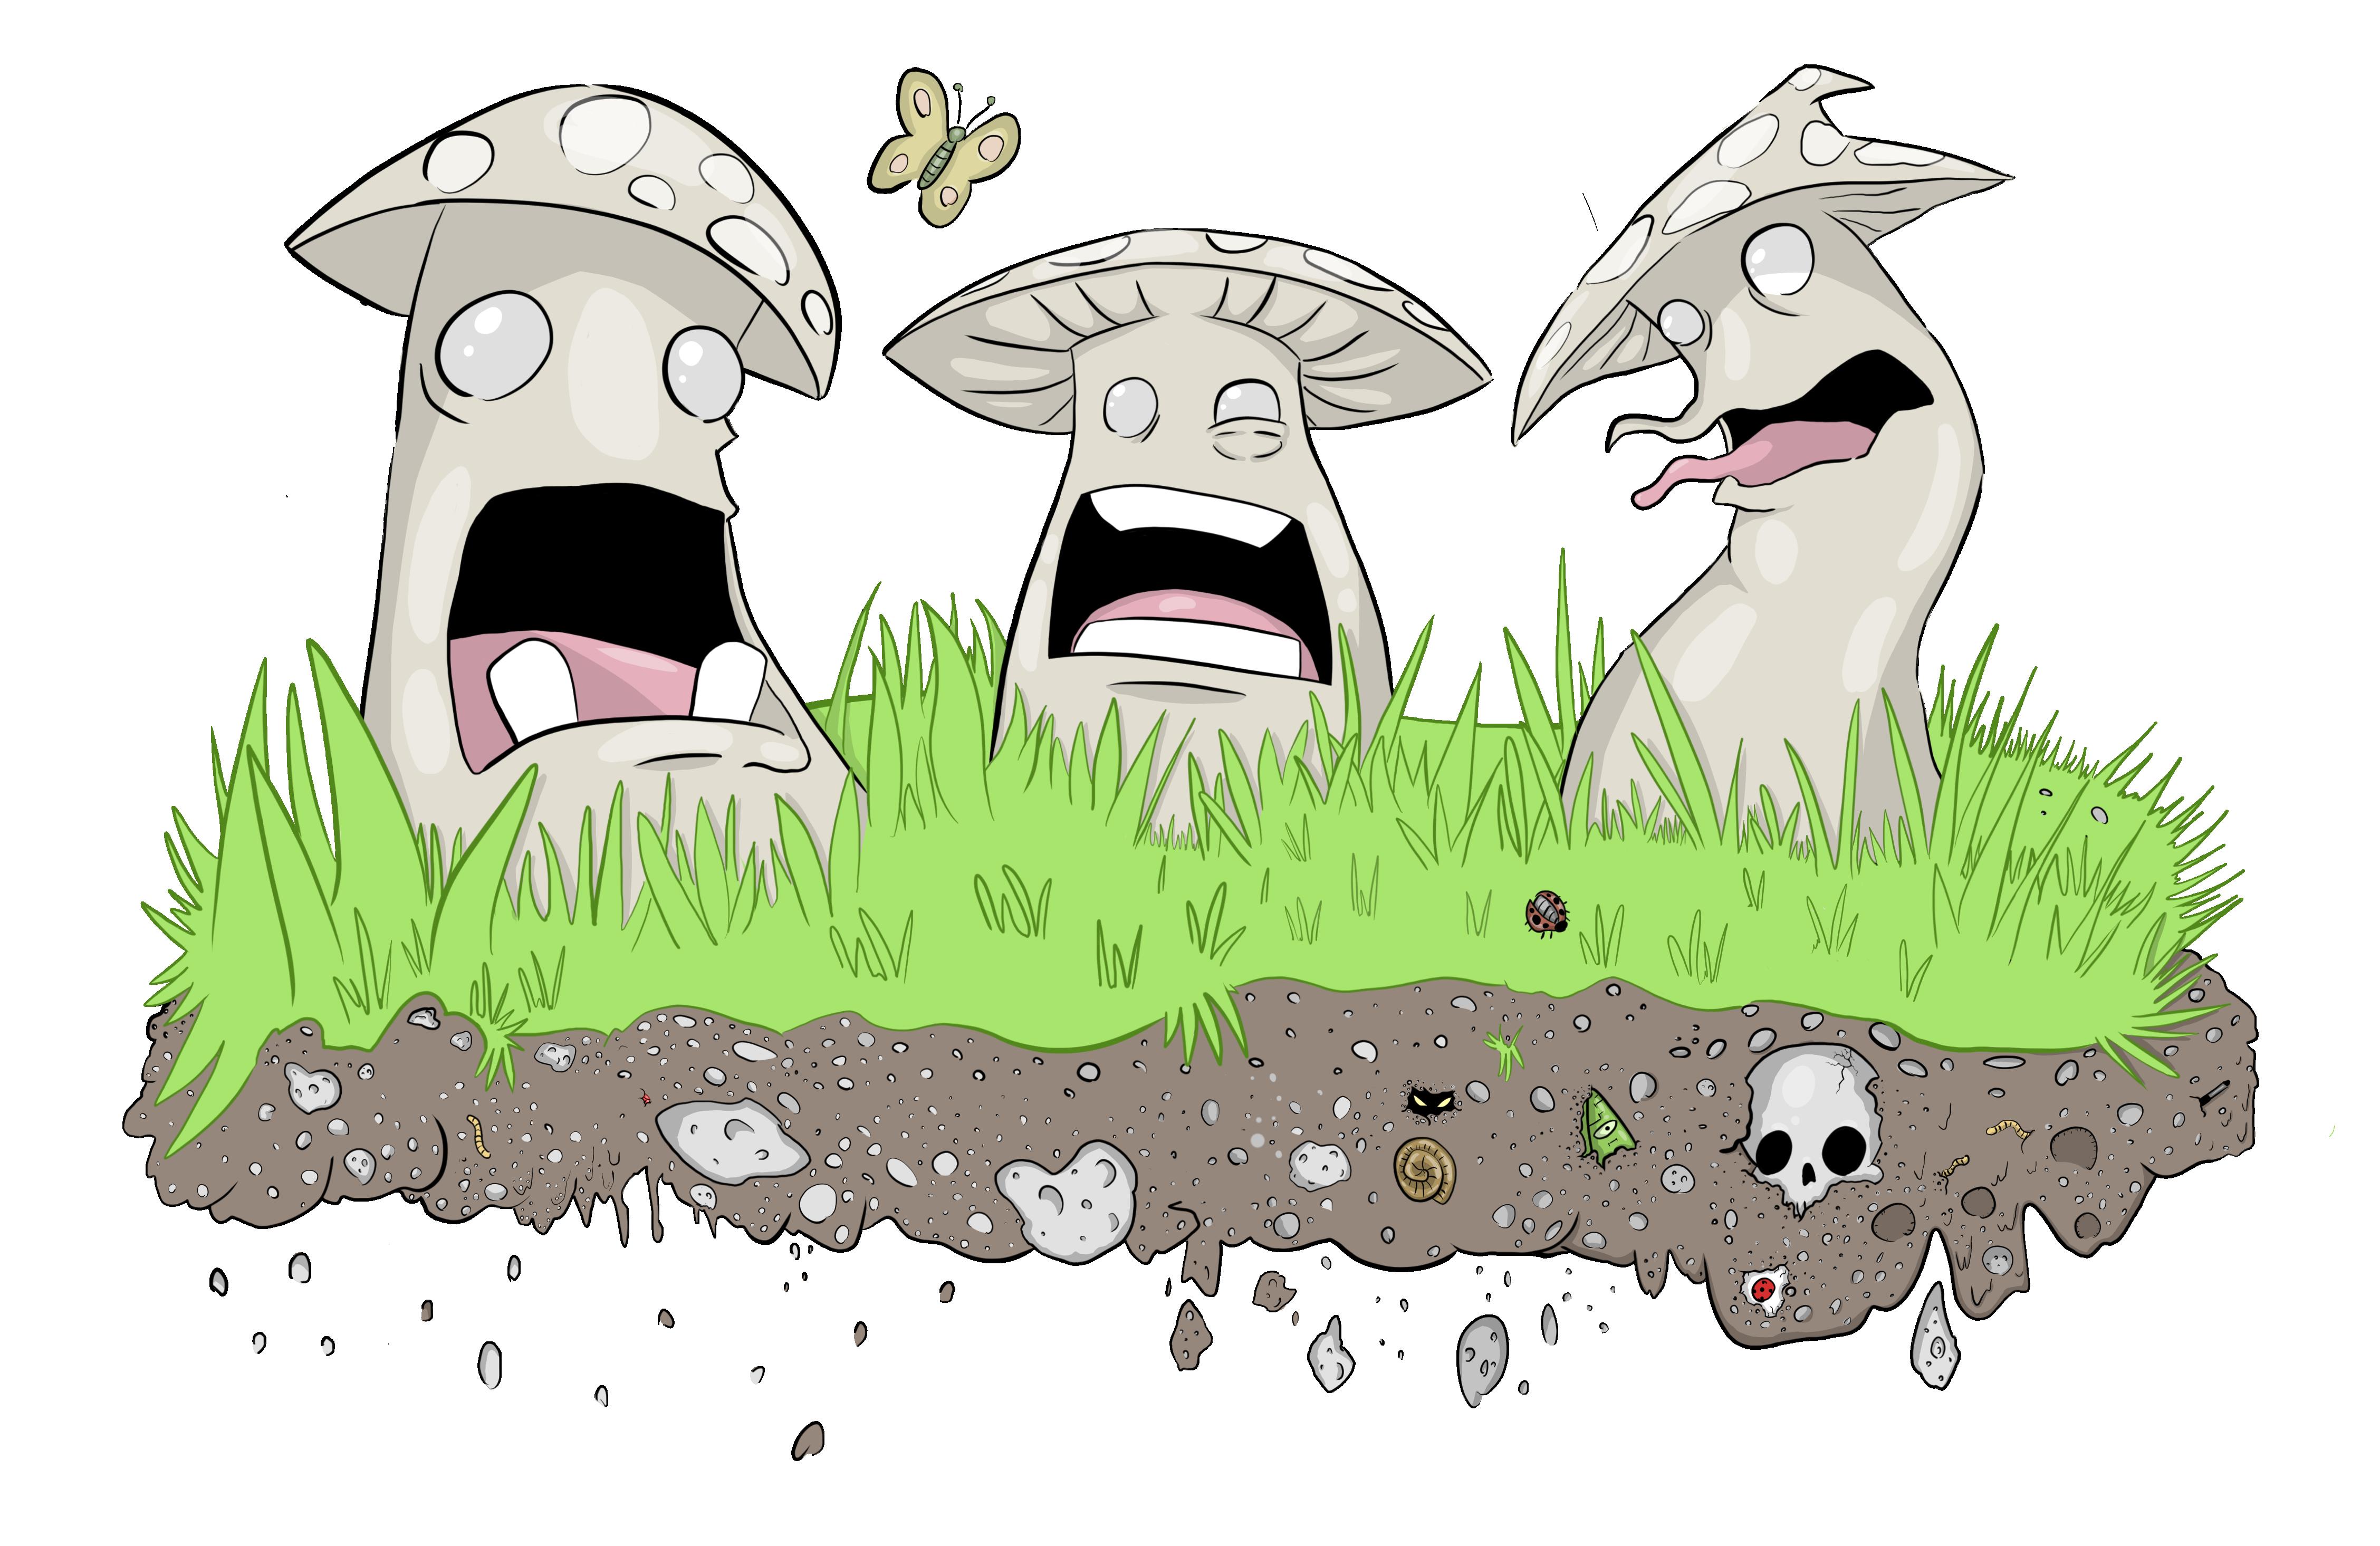 The Three Mushrooms